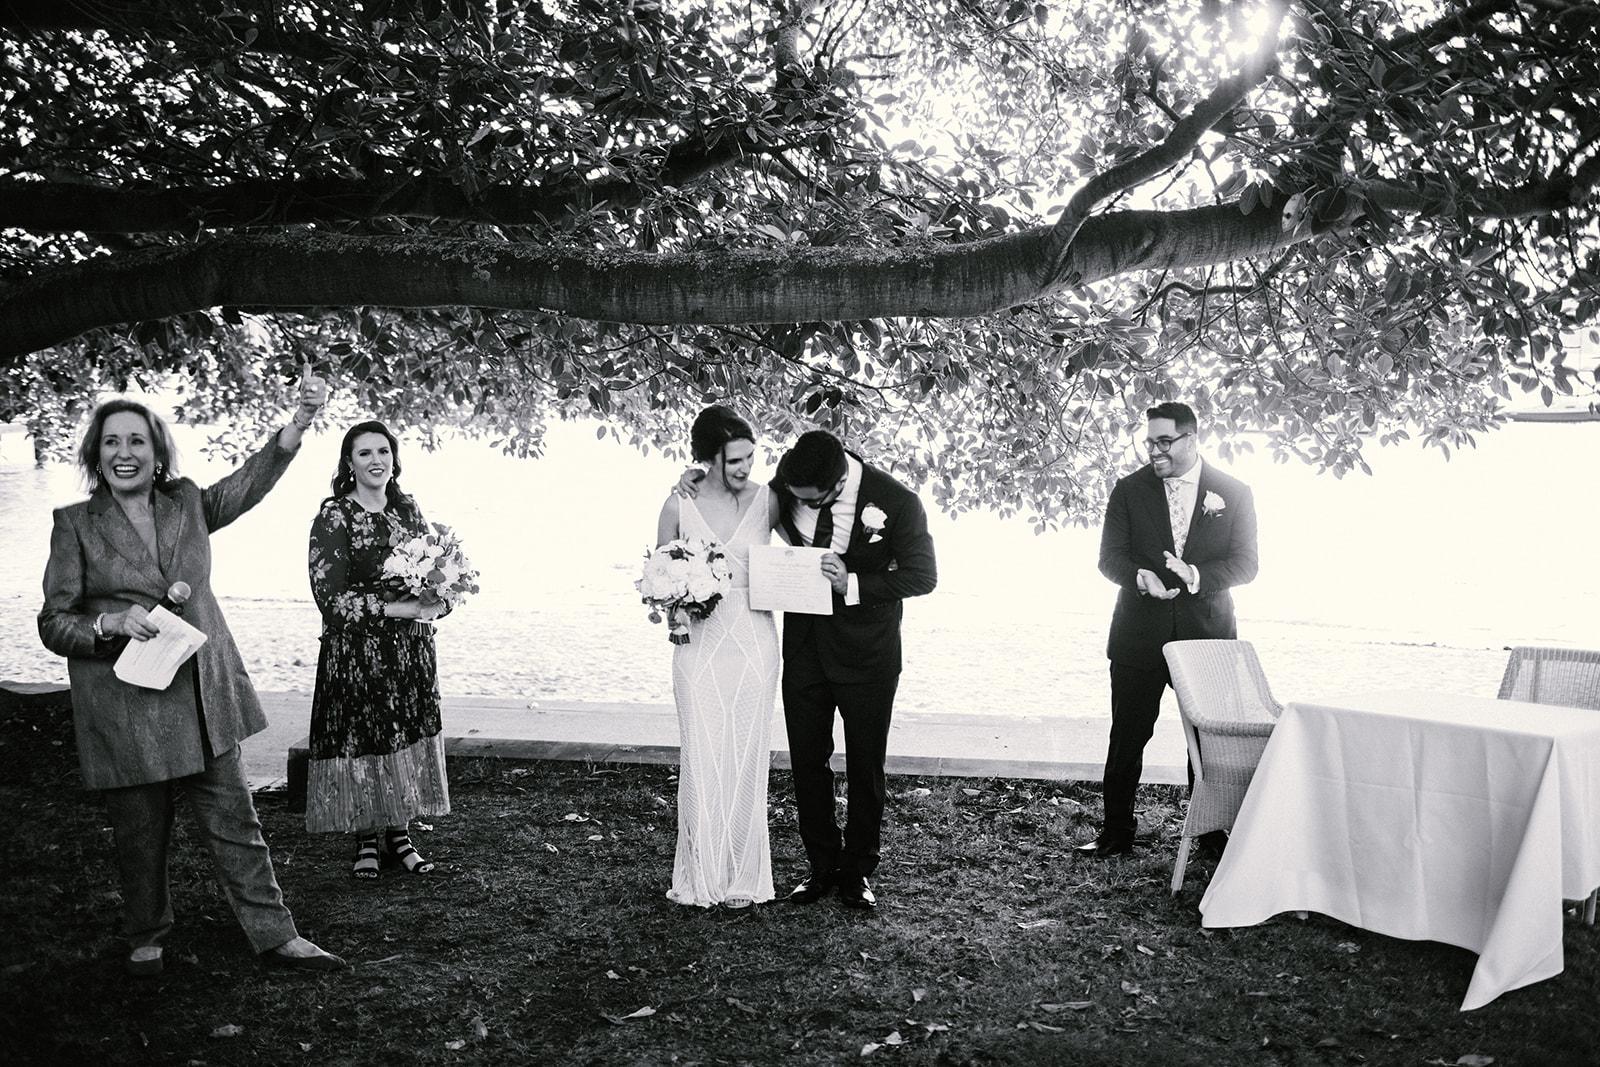 Glen-Marie Celebrant Belinda and Eduardo Welcome.jpg